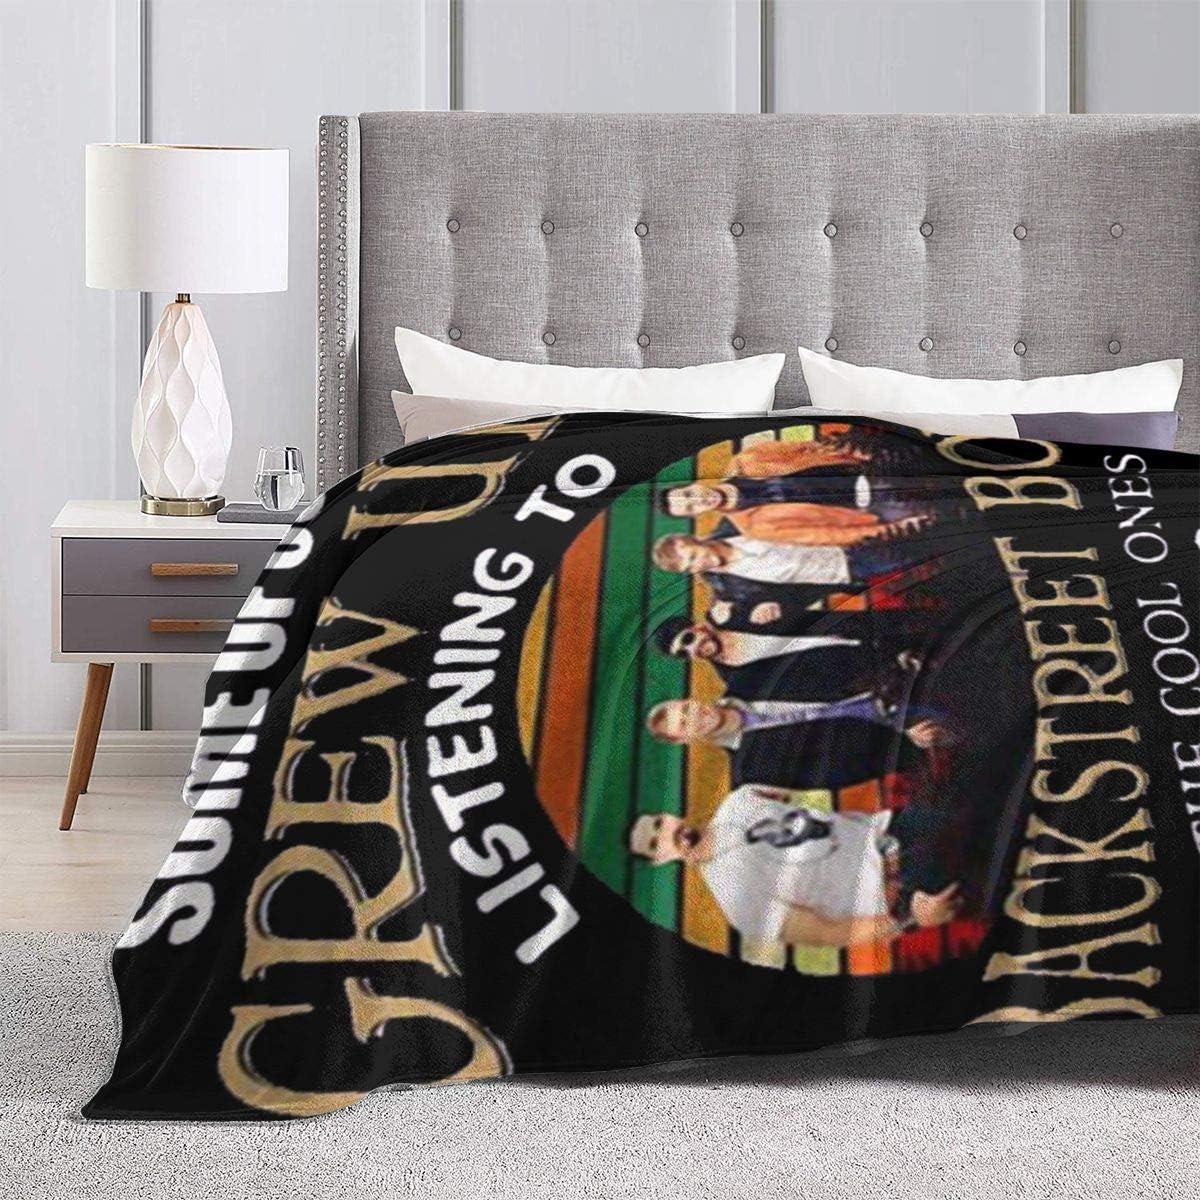 Flannel Throw Blanket Grew Up Backstreet Boys Multi-Purpose Luxurious Royal Plush Cozy Throw Blanket for Sofa Cold Cinema Car Inner Or Travel